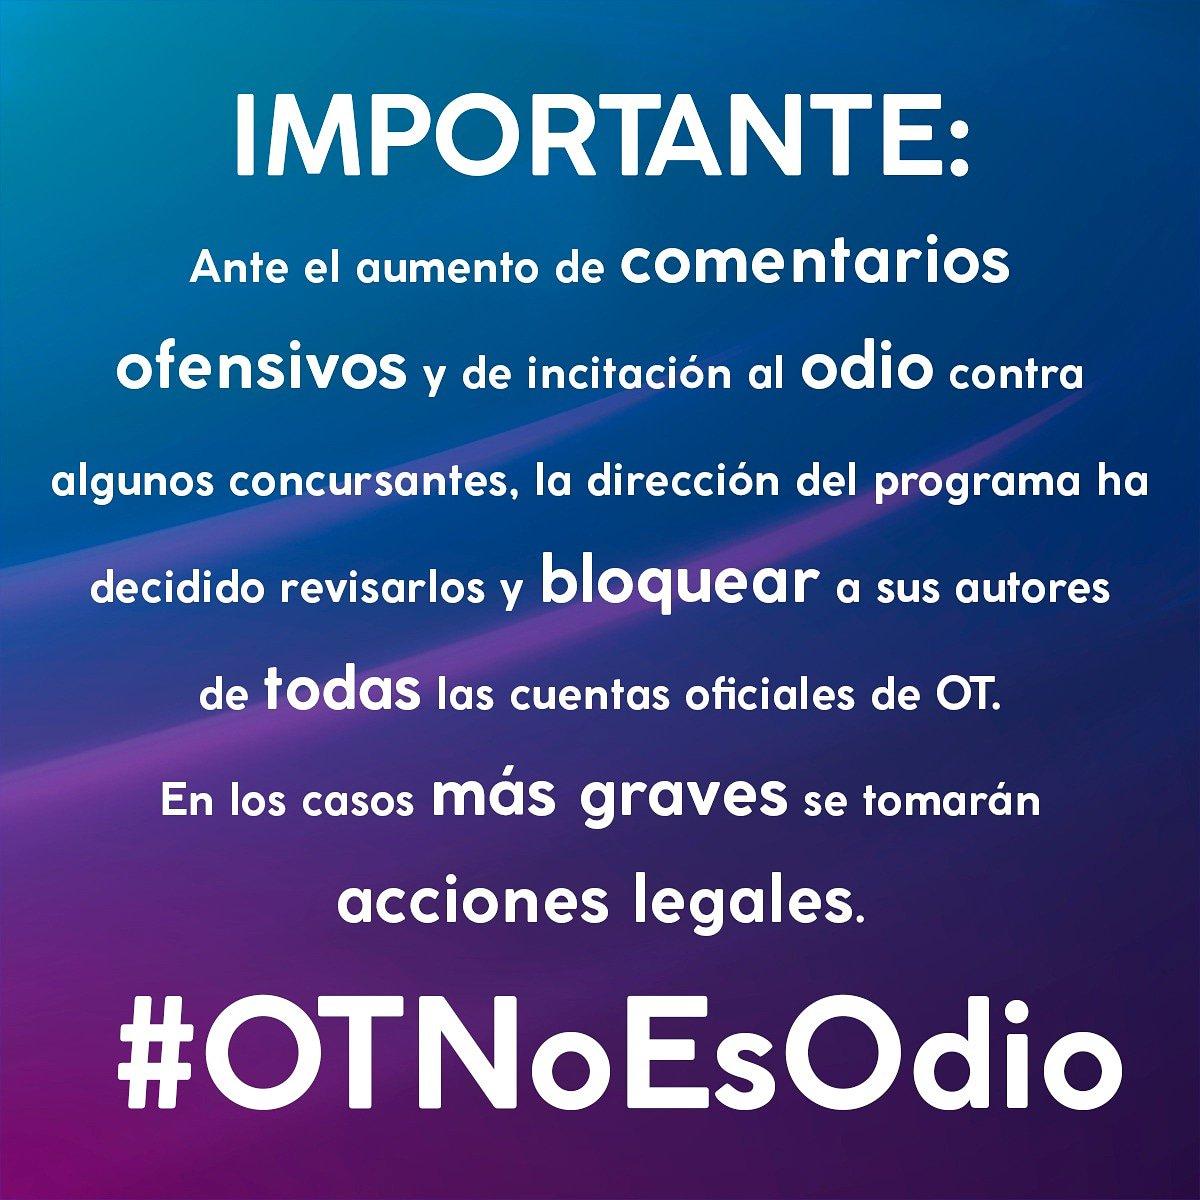 RT @mariaot2018: #OTNoEsOdio https://t.co/M7lr629EBg